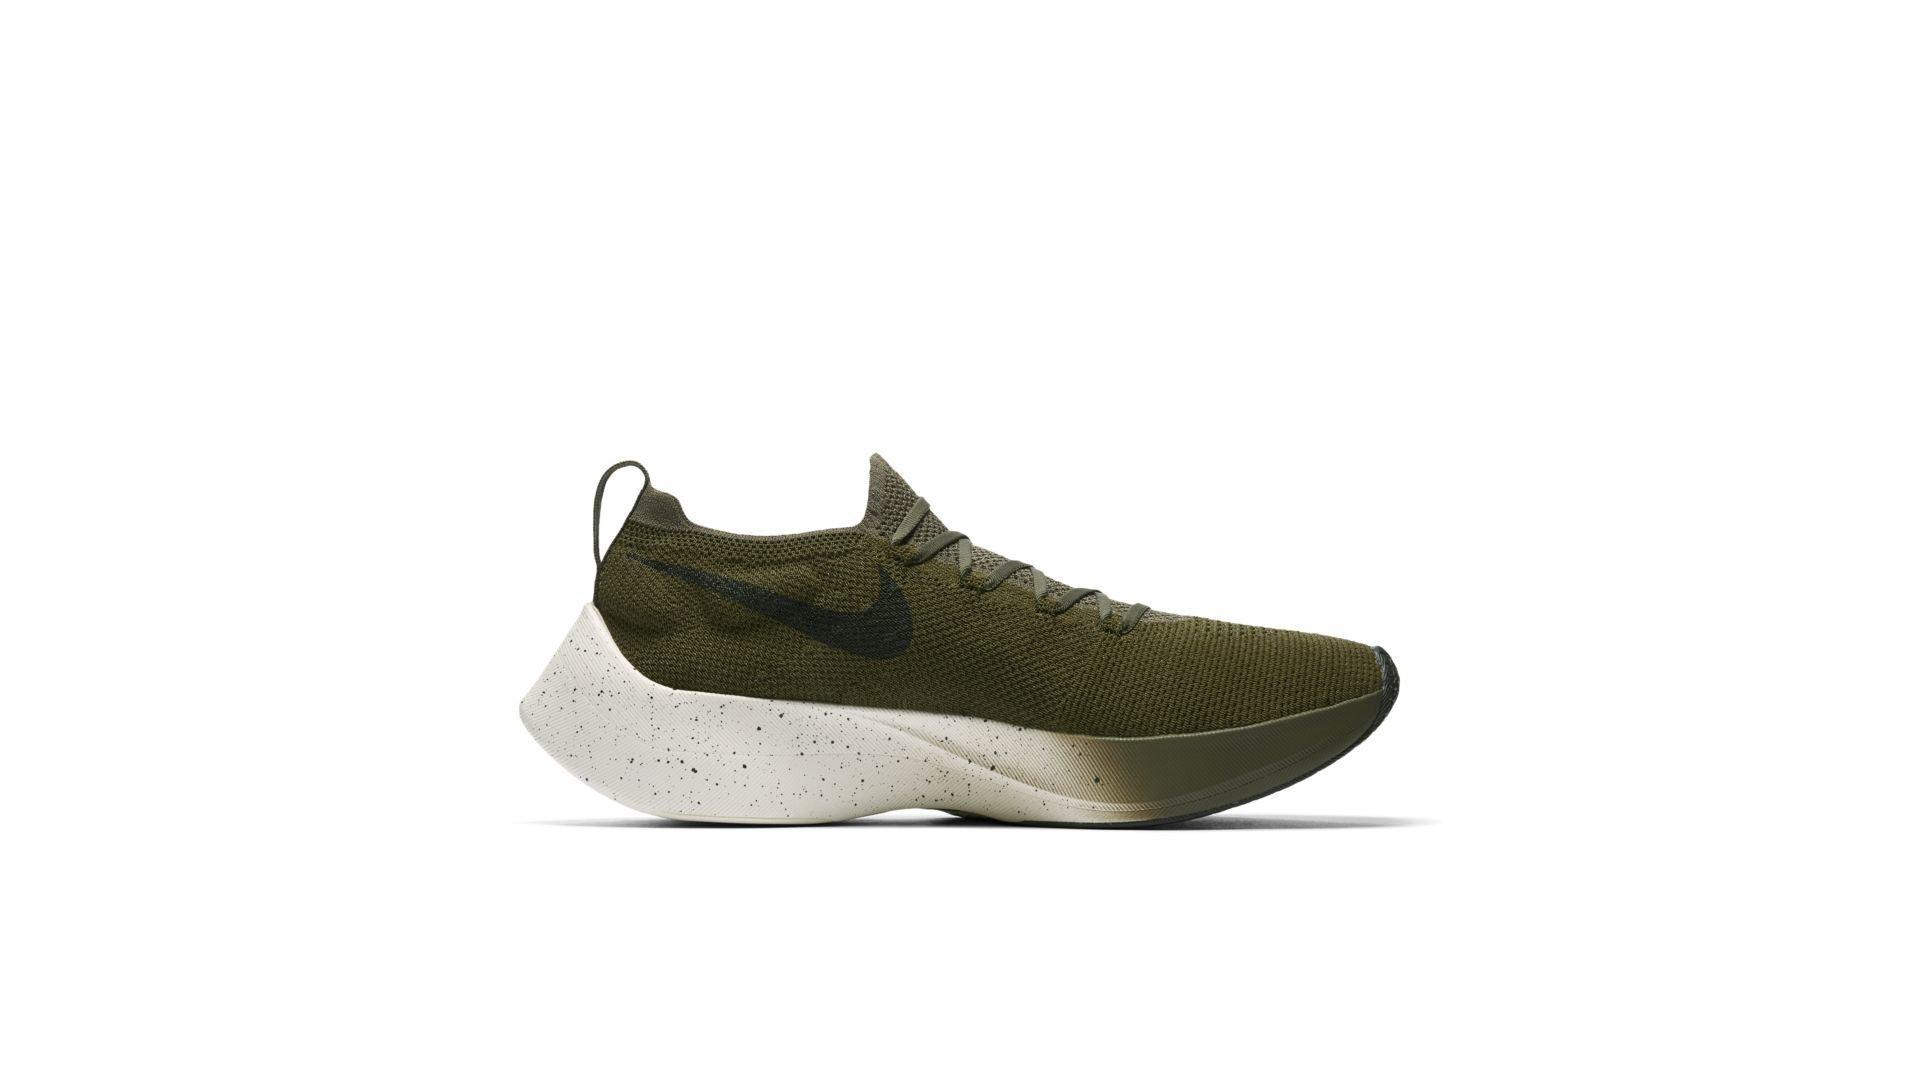 Nike Vapor Street Flyknit Medium Olive (AQ1763-201)